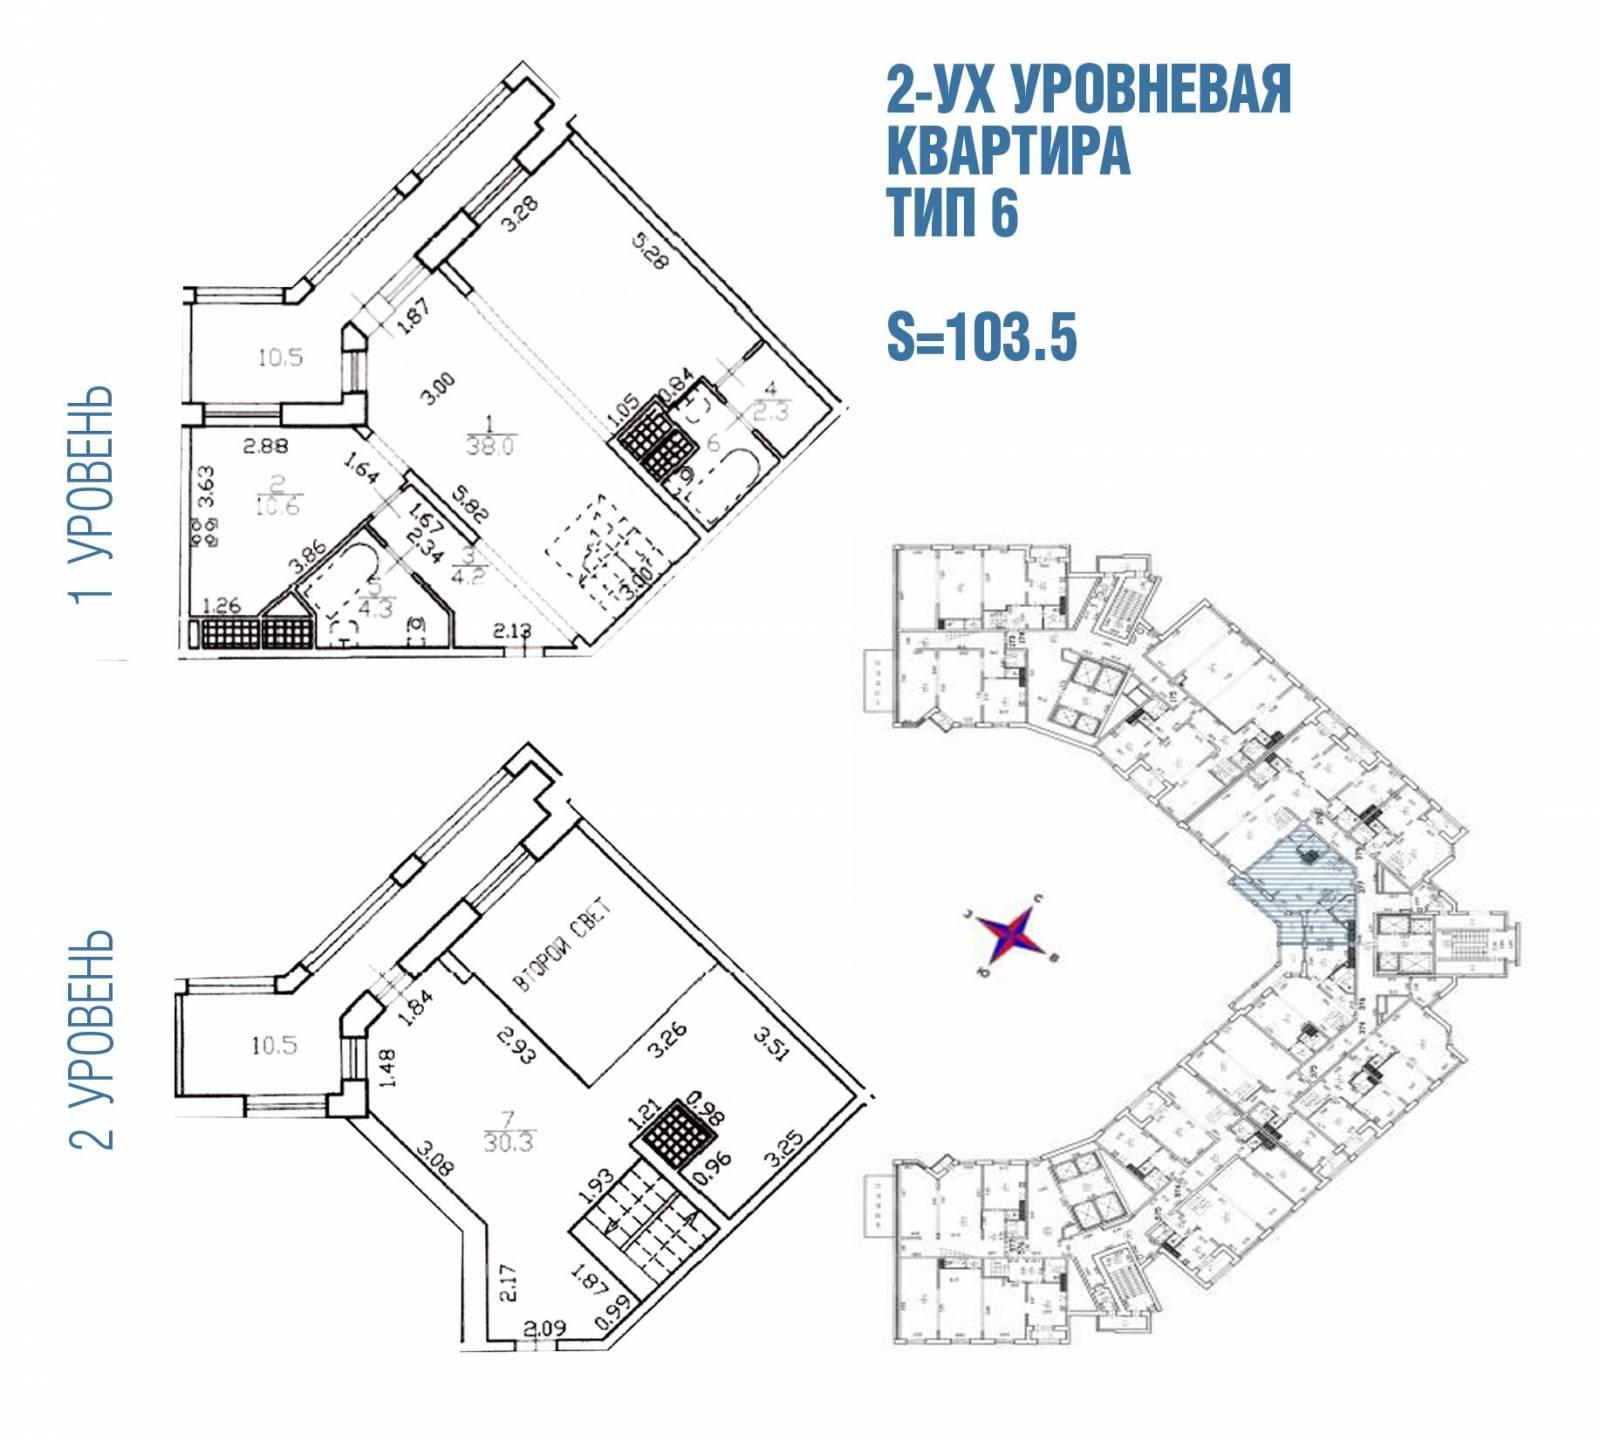 Двухуровневая квартира тип 6 S=103,5